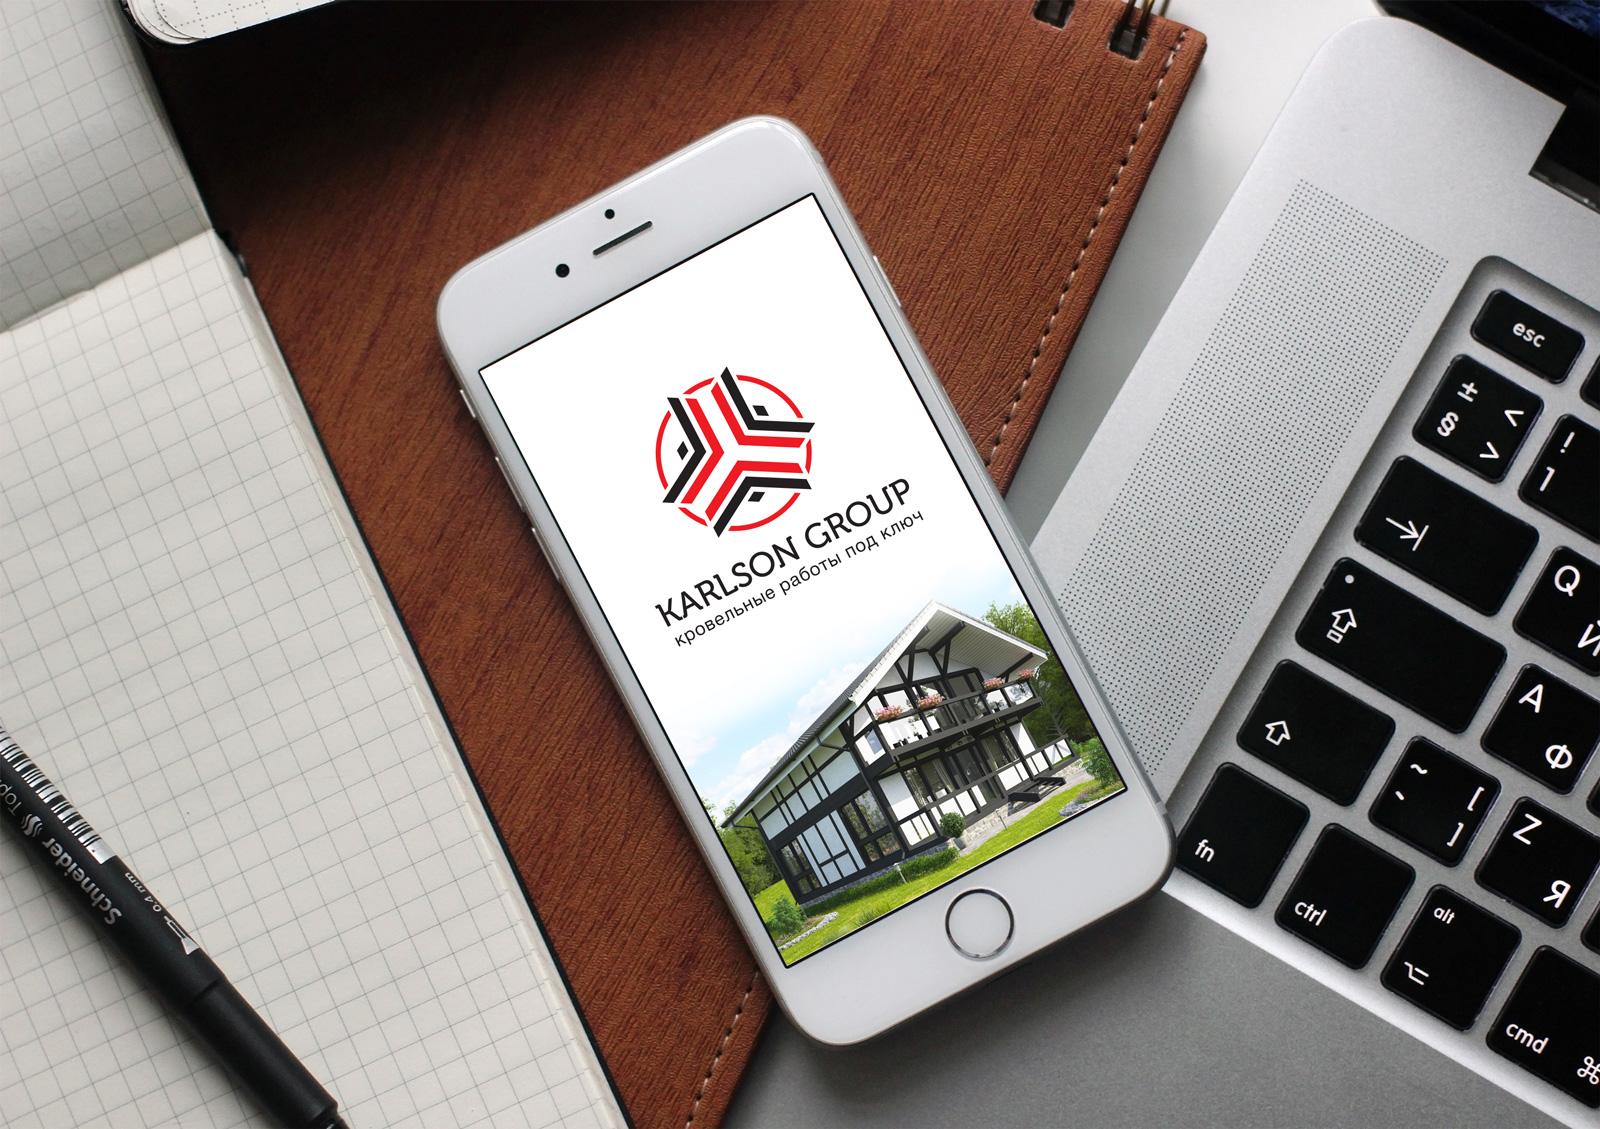 Придумать классный логотип фото f_43159907cc537aaa.jpg